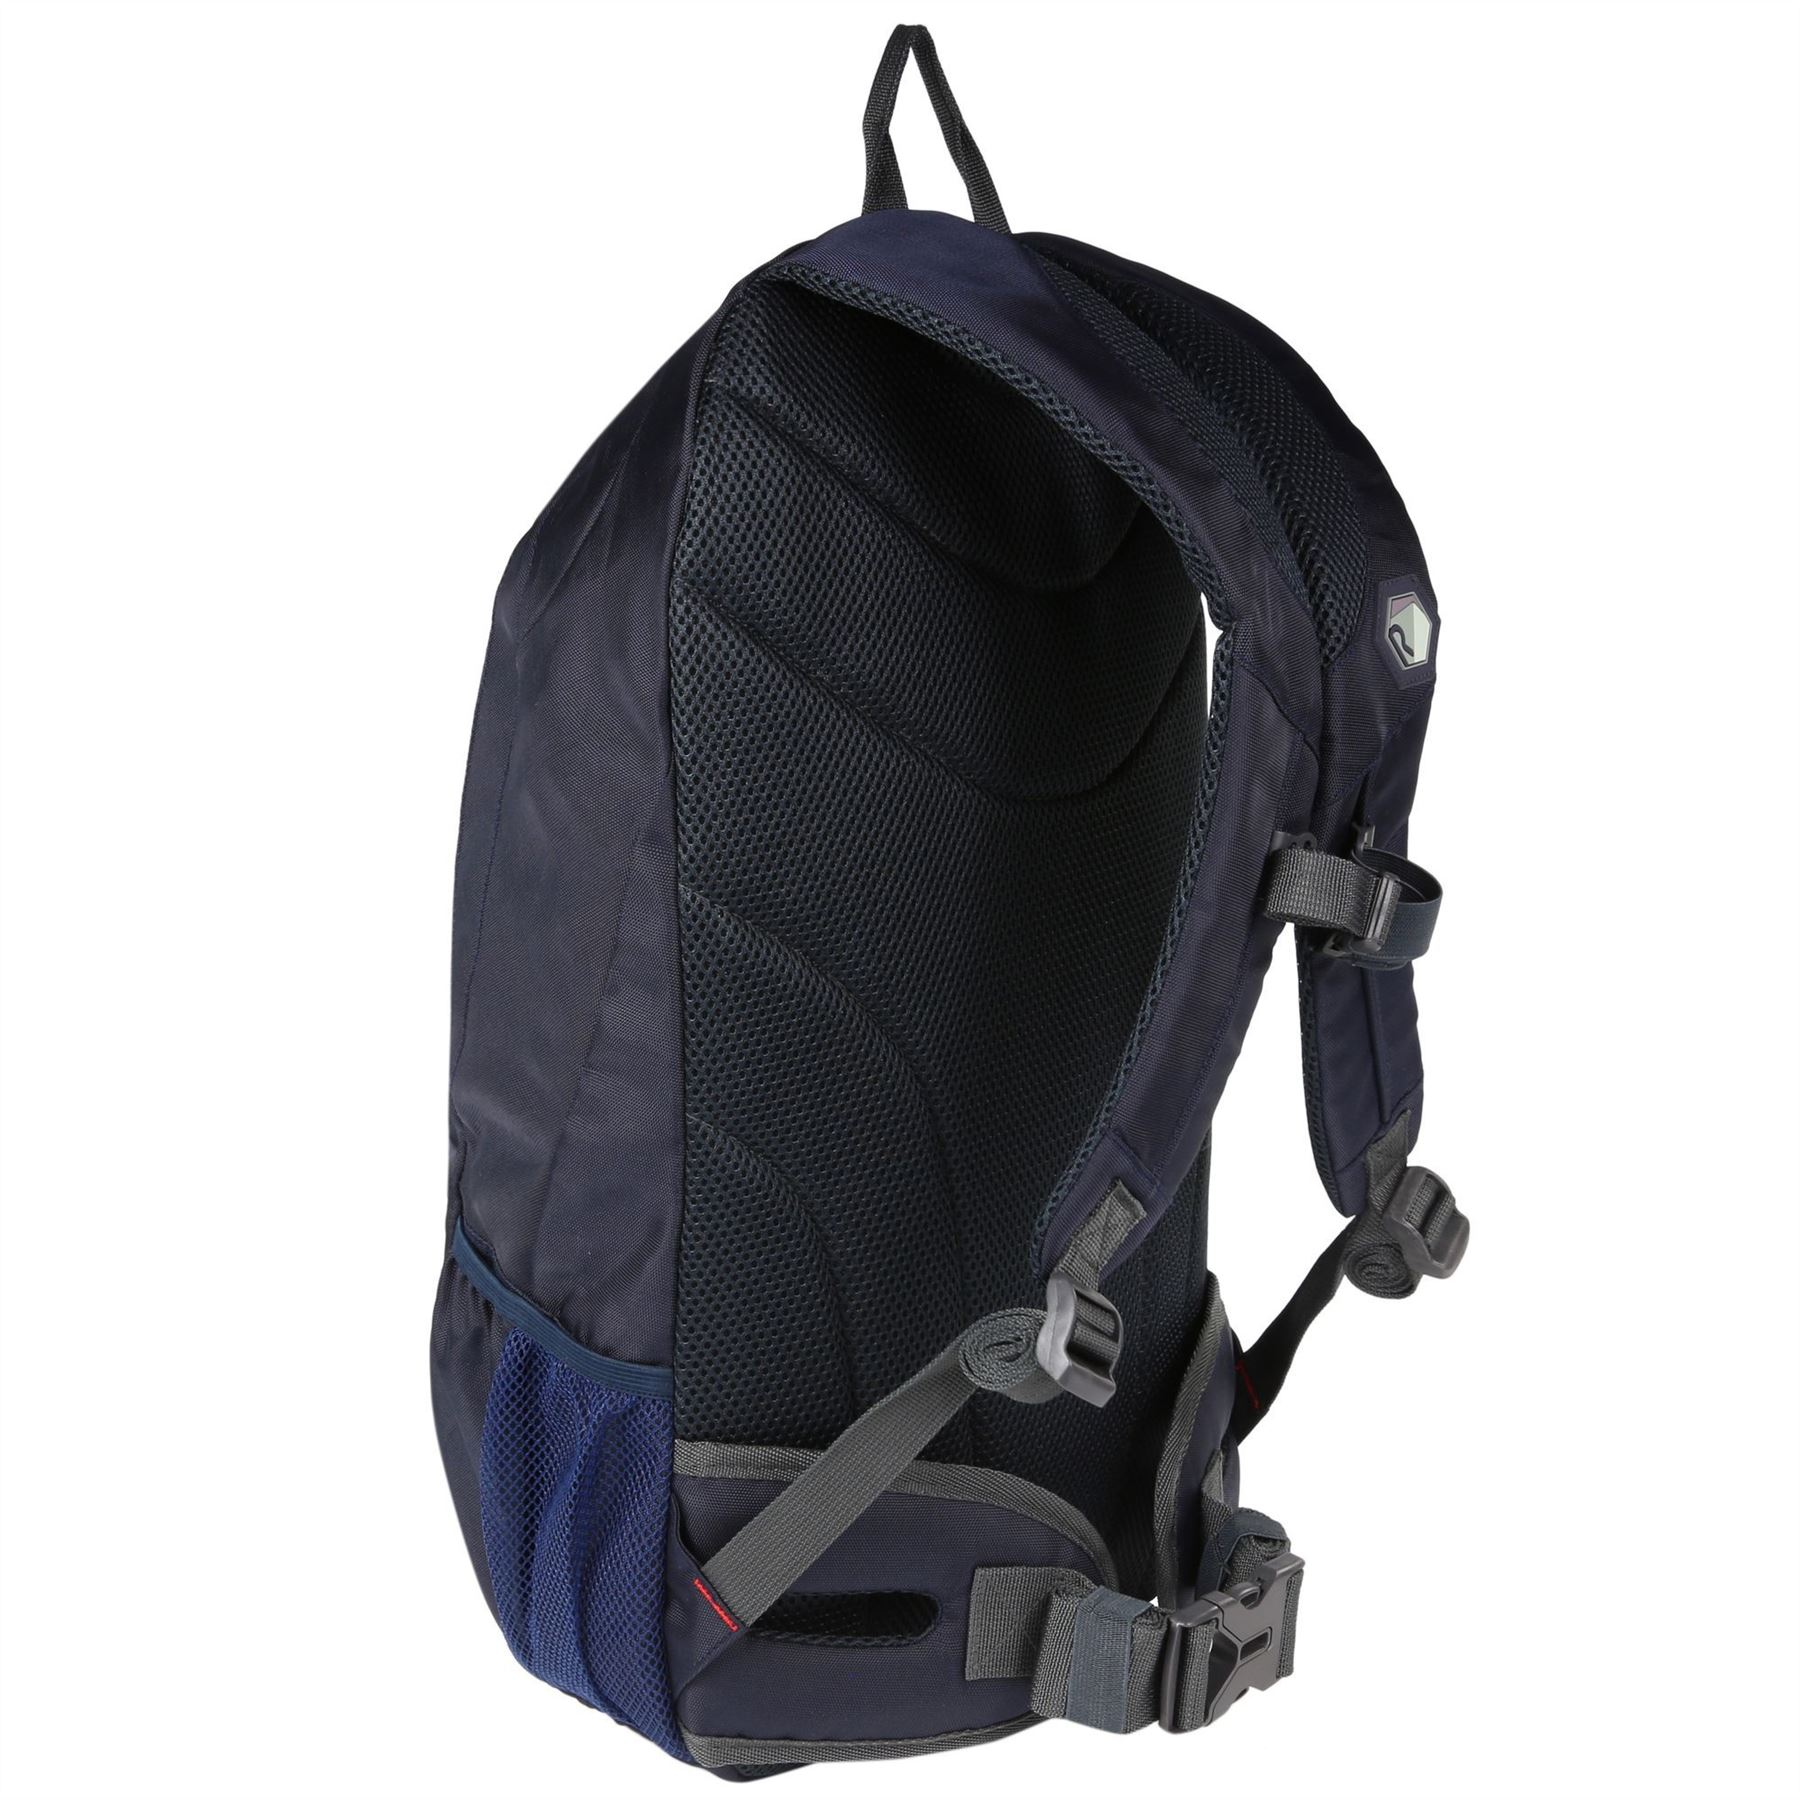 miniatuur 7 - Regatta Atholl II 35 Litre Walking Backpack Rucksack Mens Womens Hiking Travel